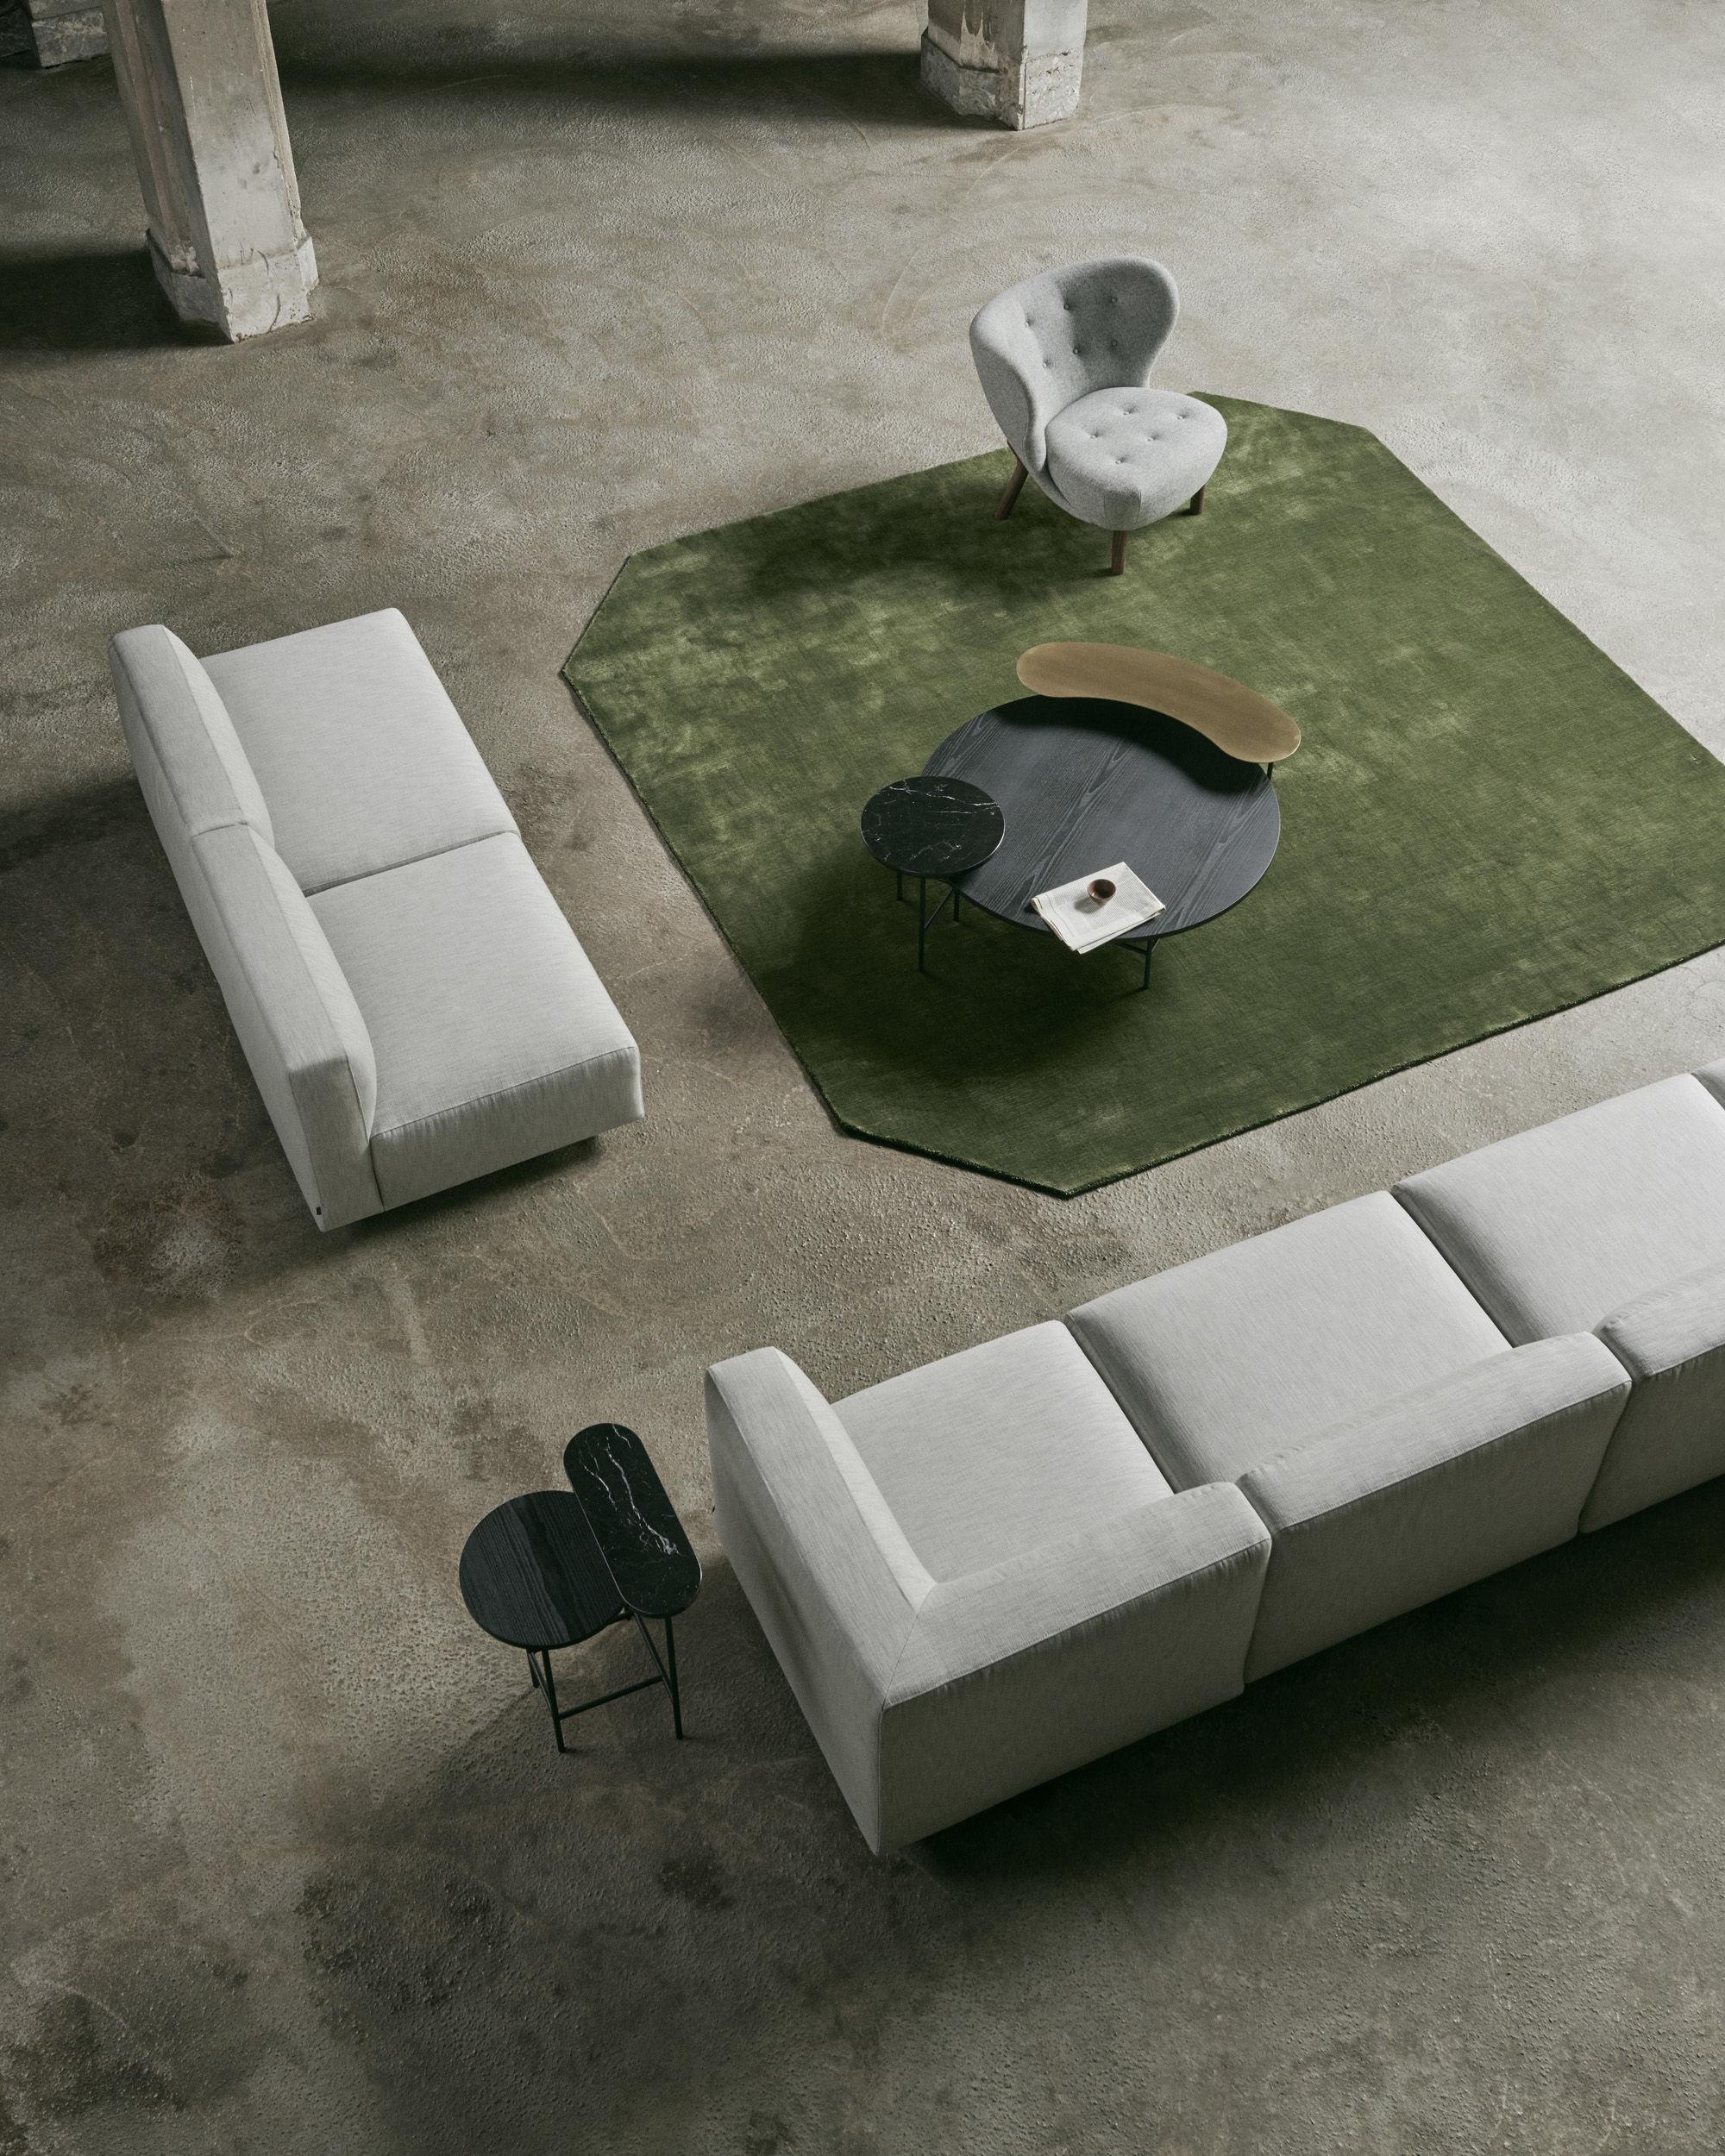 teppich the moor ap6 von tradition gr n made in design. Black Bedroom Furniture Sets. Home Design Ideas